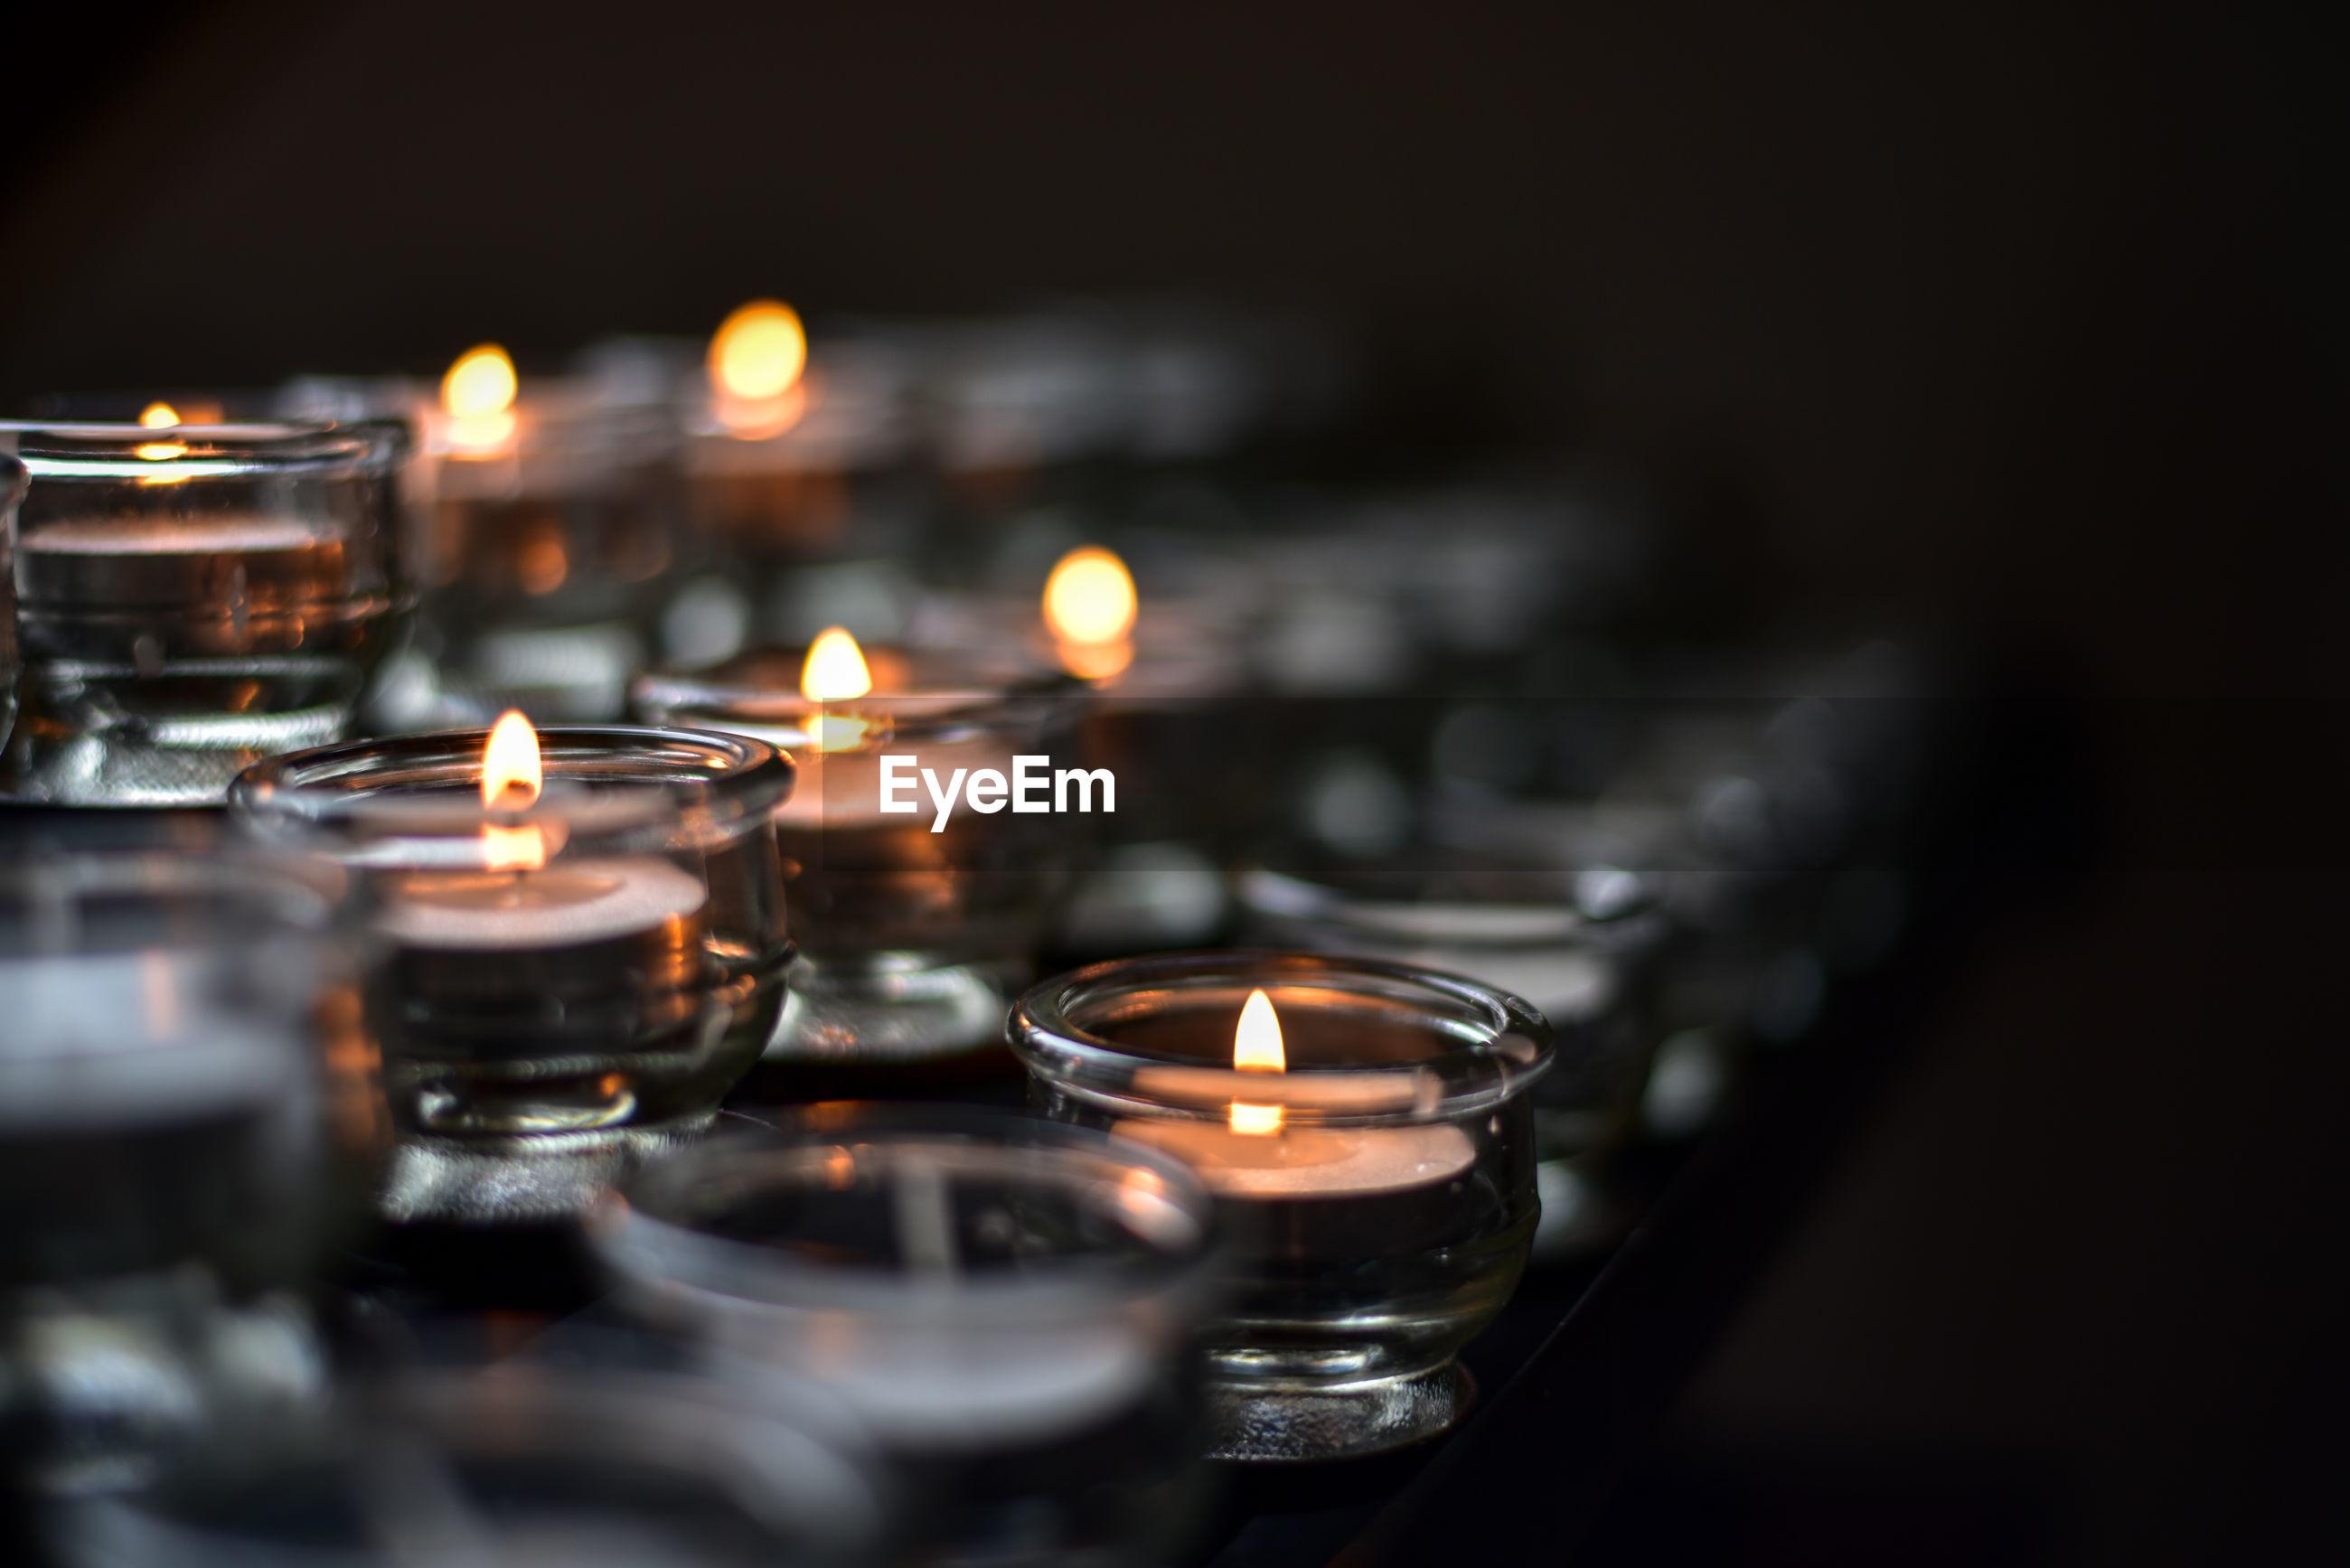 Close-up of illuminated tea lights in darkroom